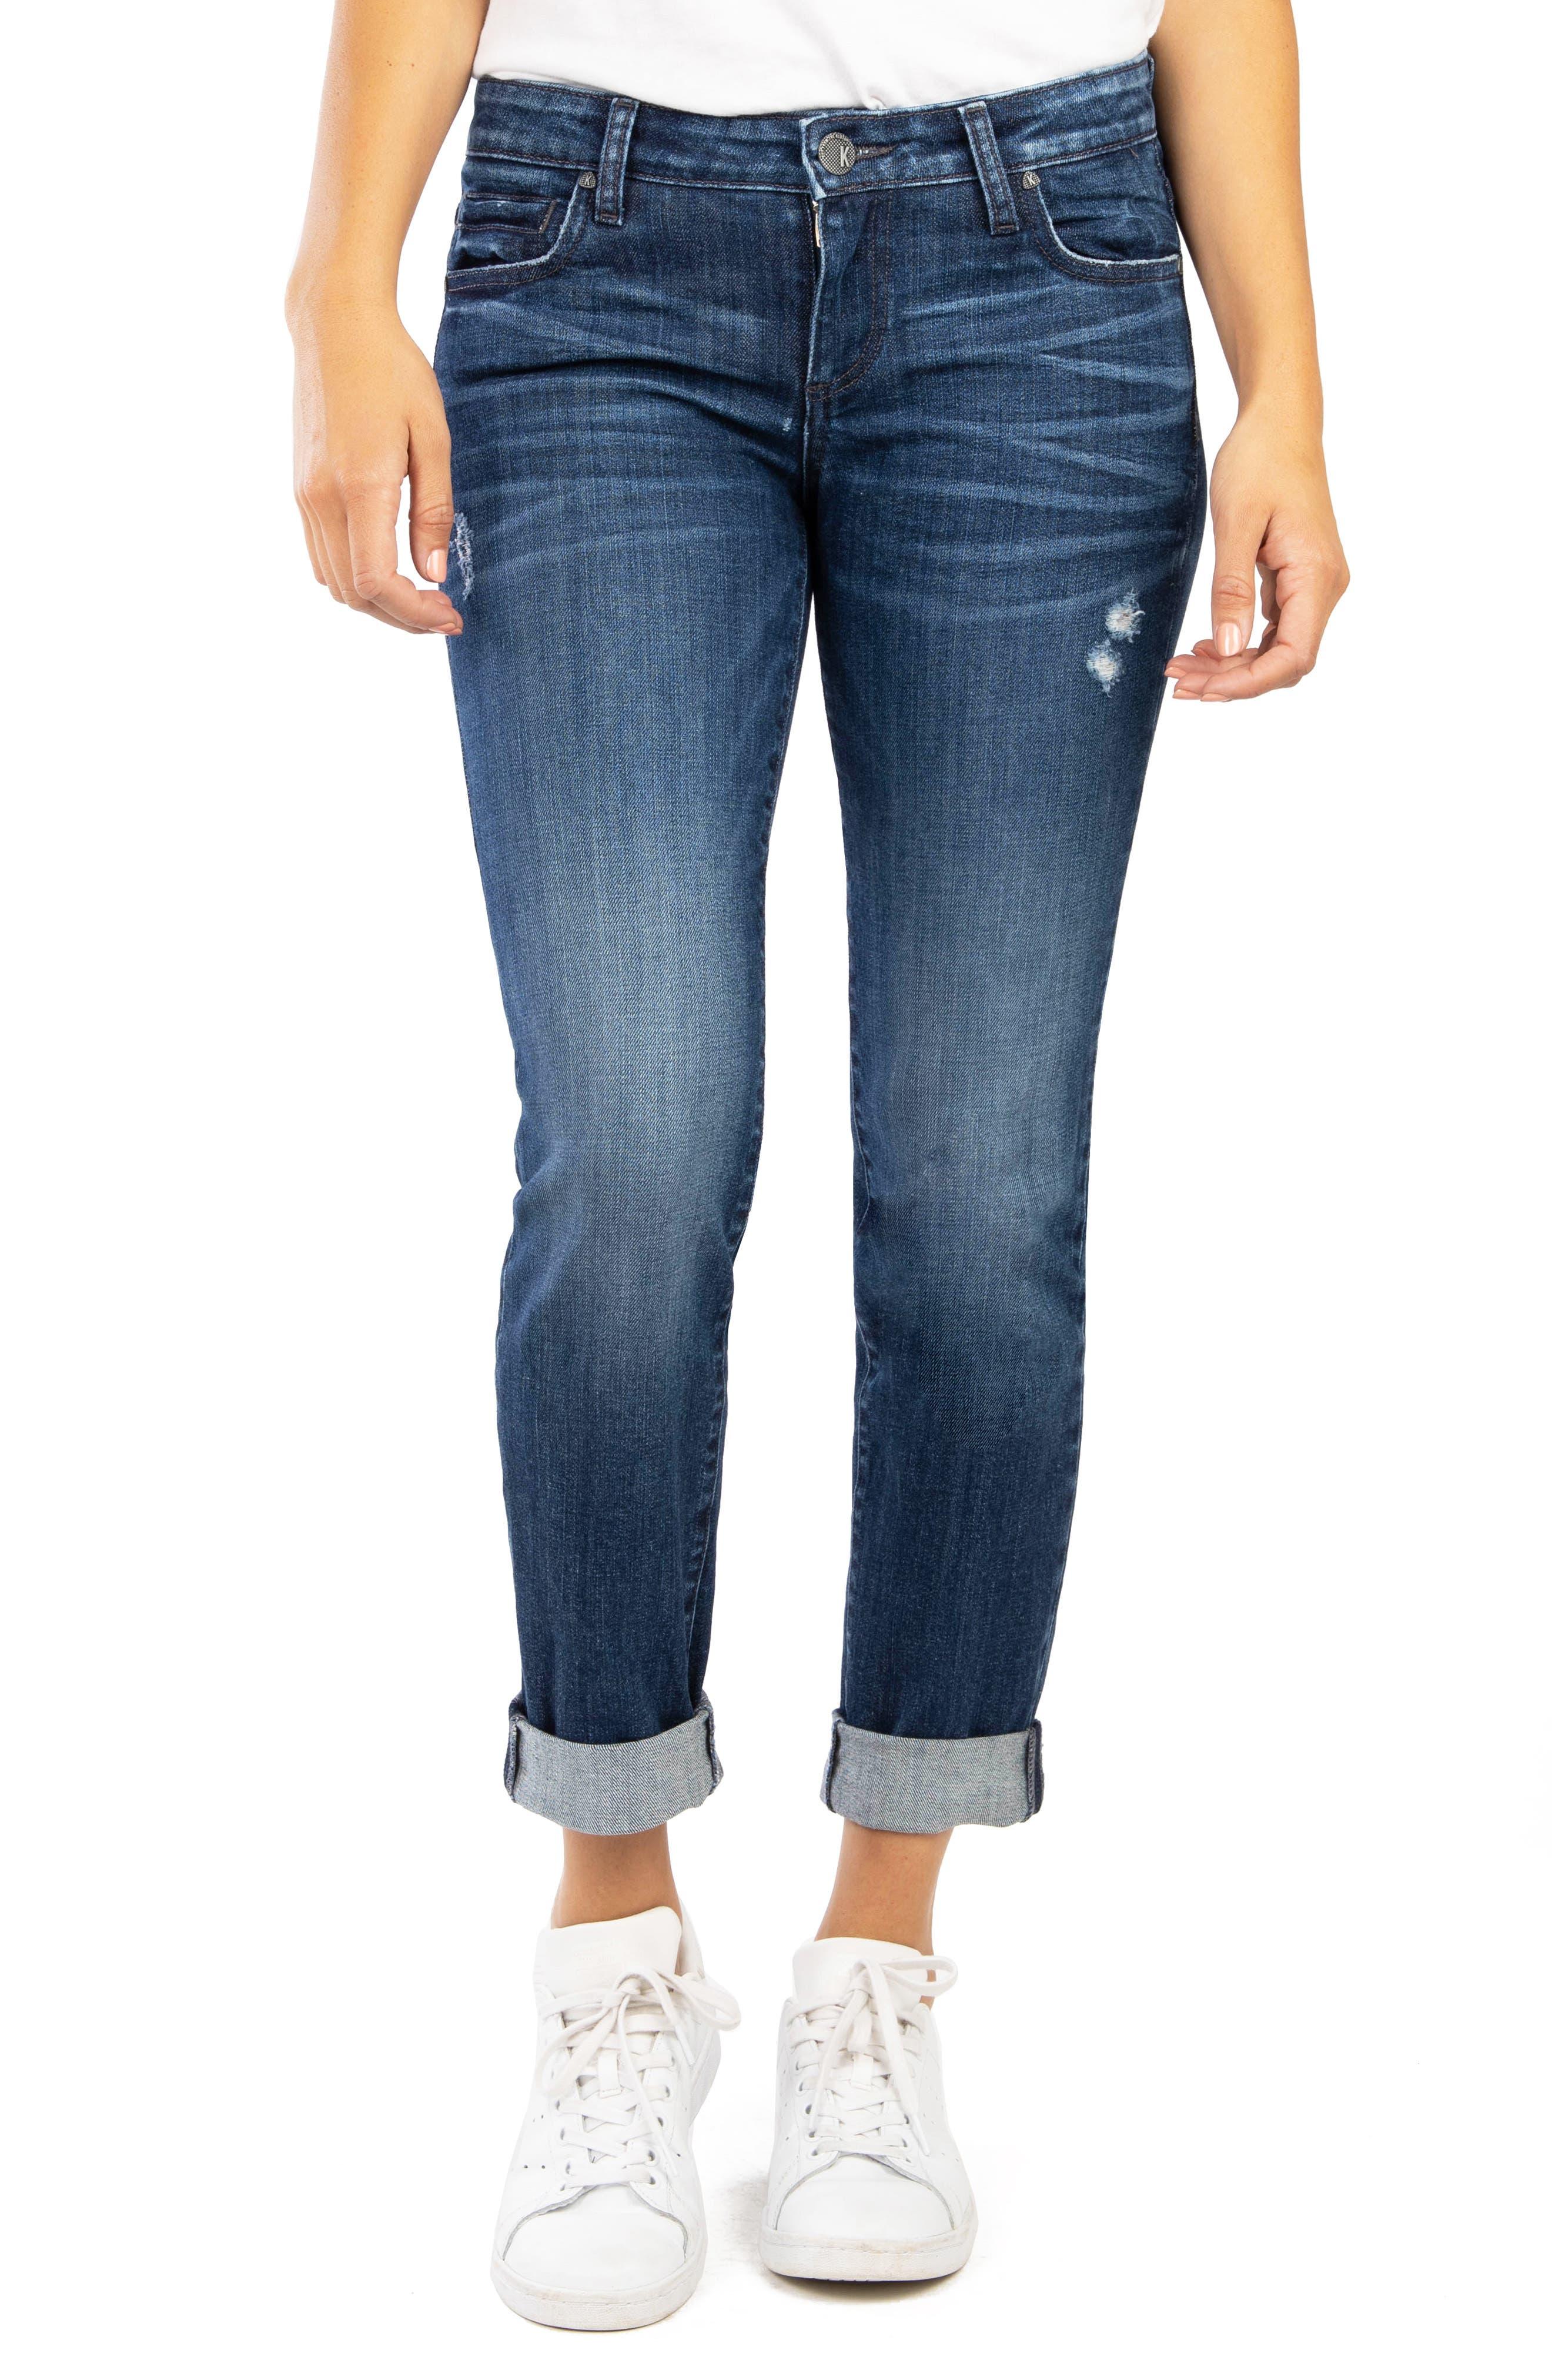 Catherine Distressed Boyfriend Jeans